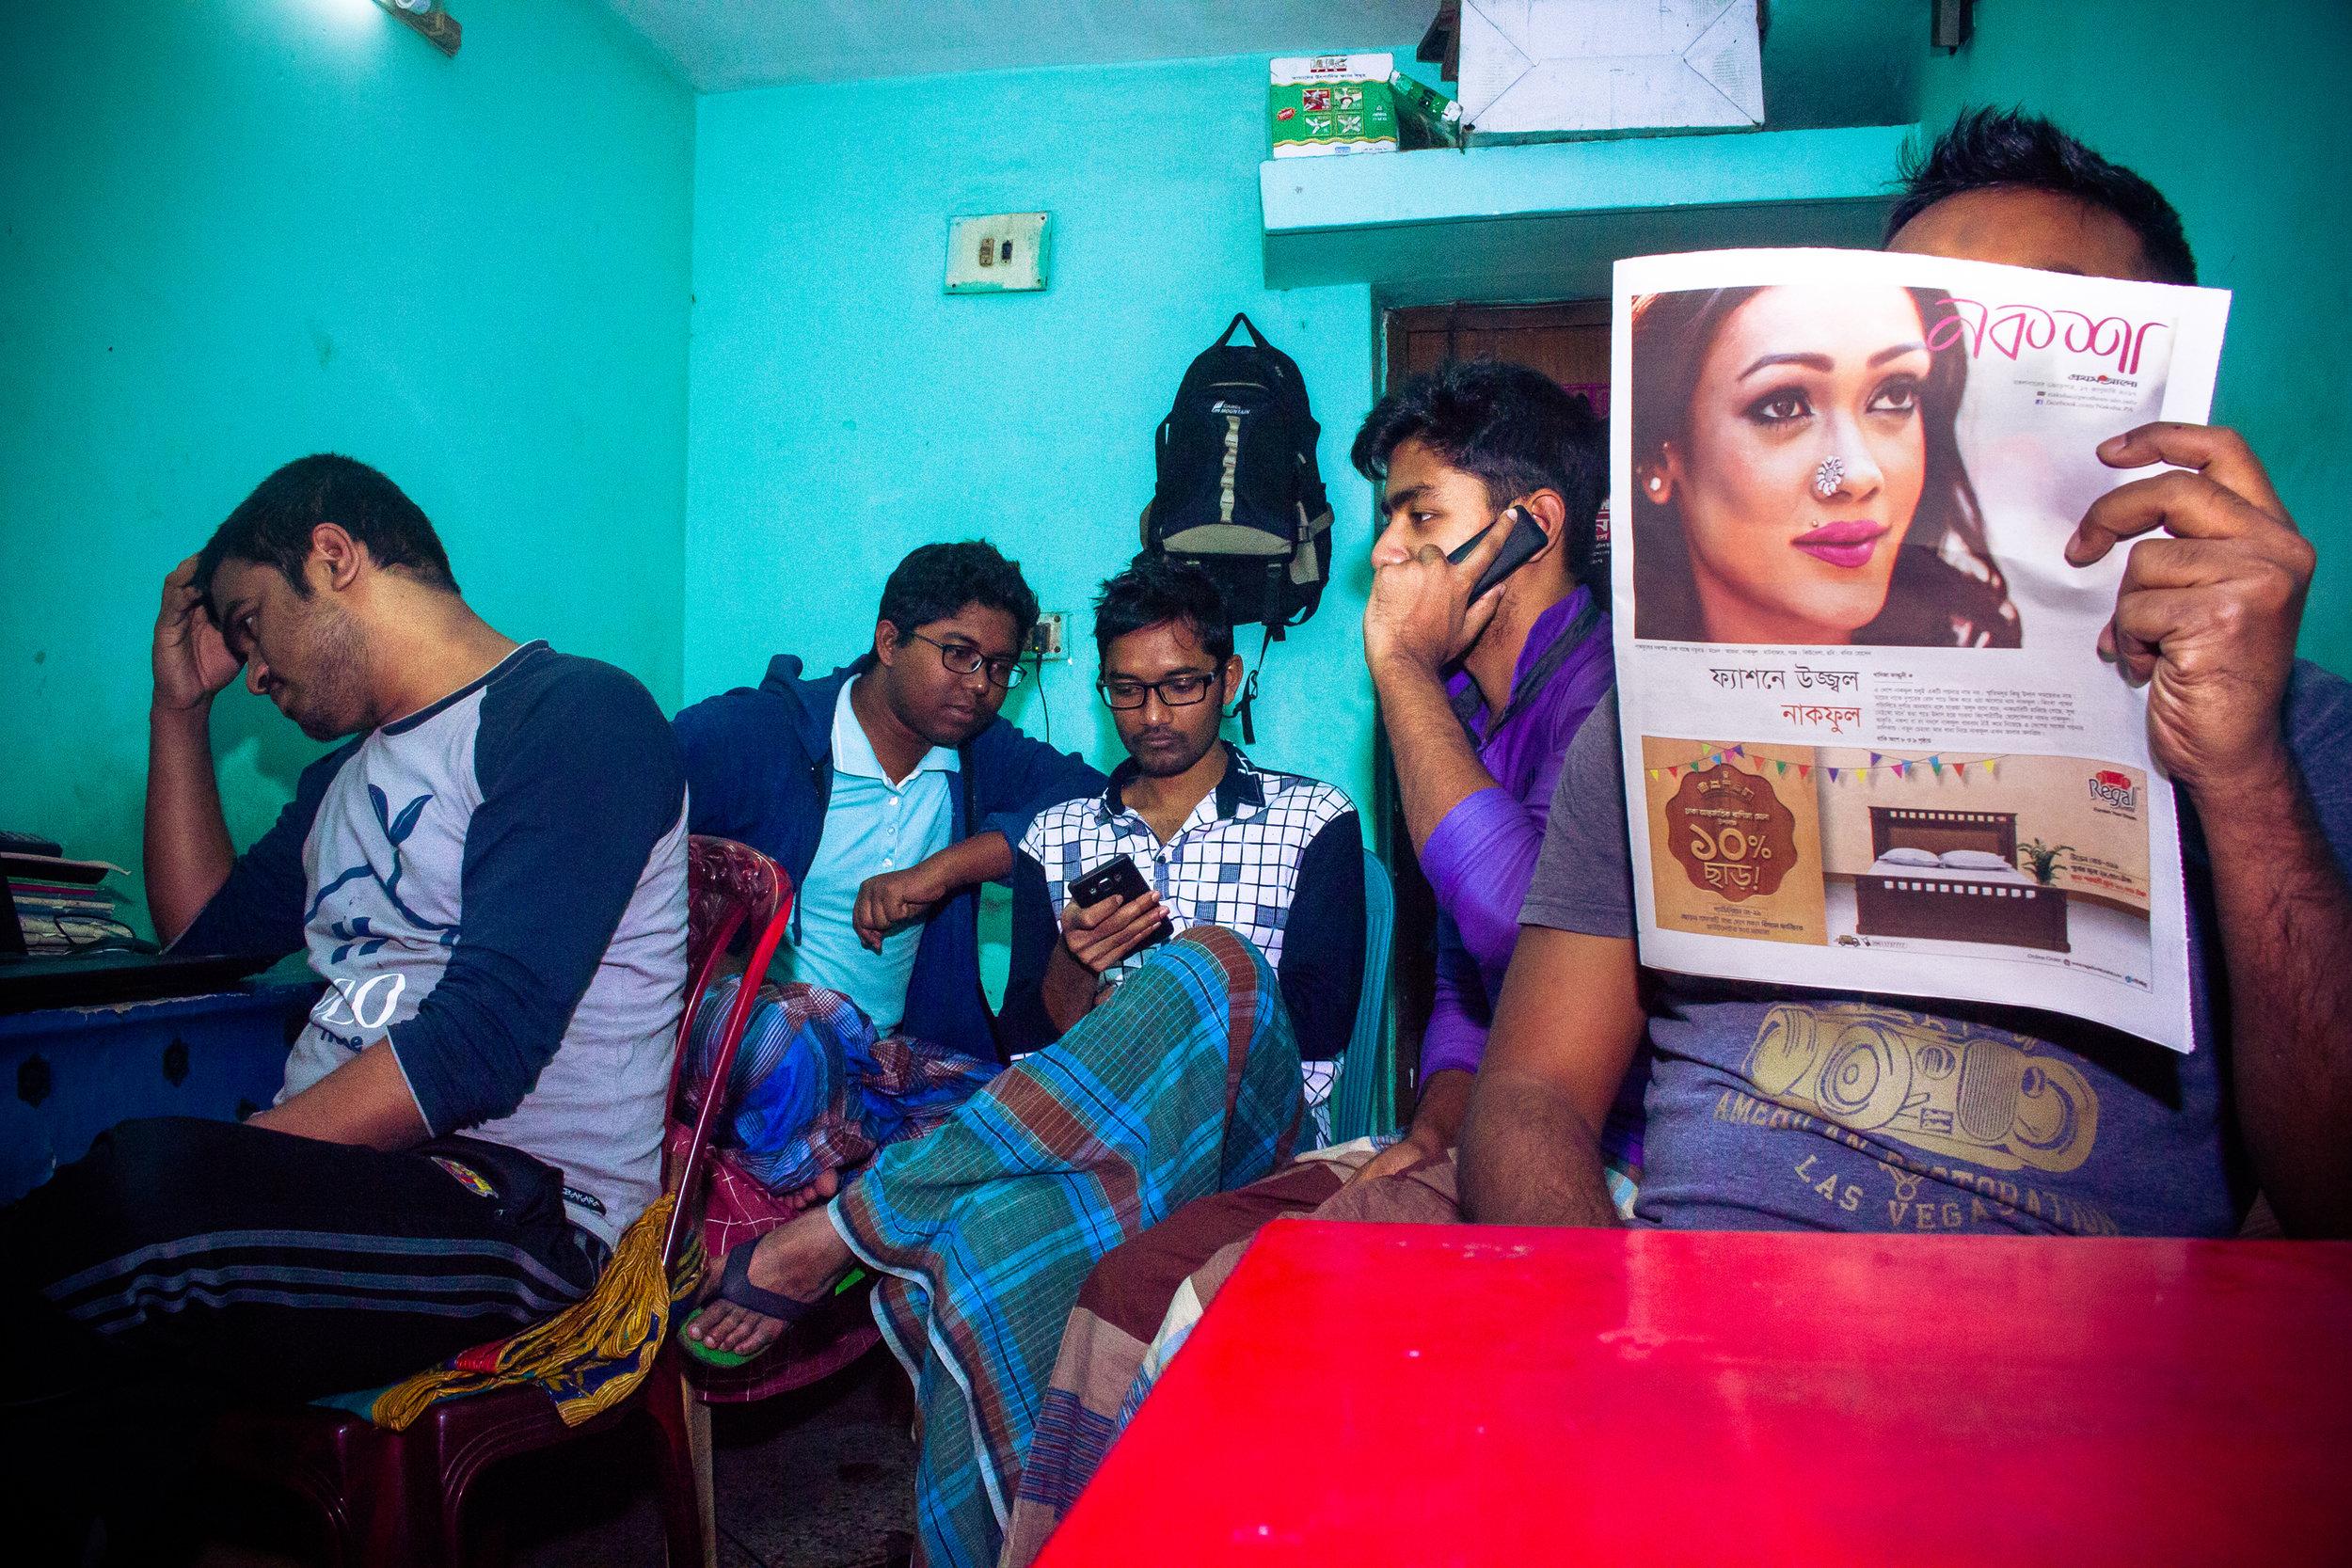 The guys that currently live at 55/E: Enamul,    Shohel, Rajib, Shahrukh, Saiful and     Polash (Polash is missing from the photo    )